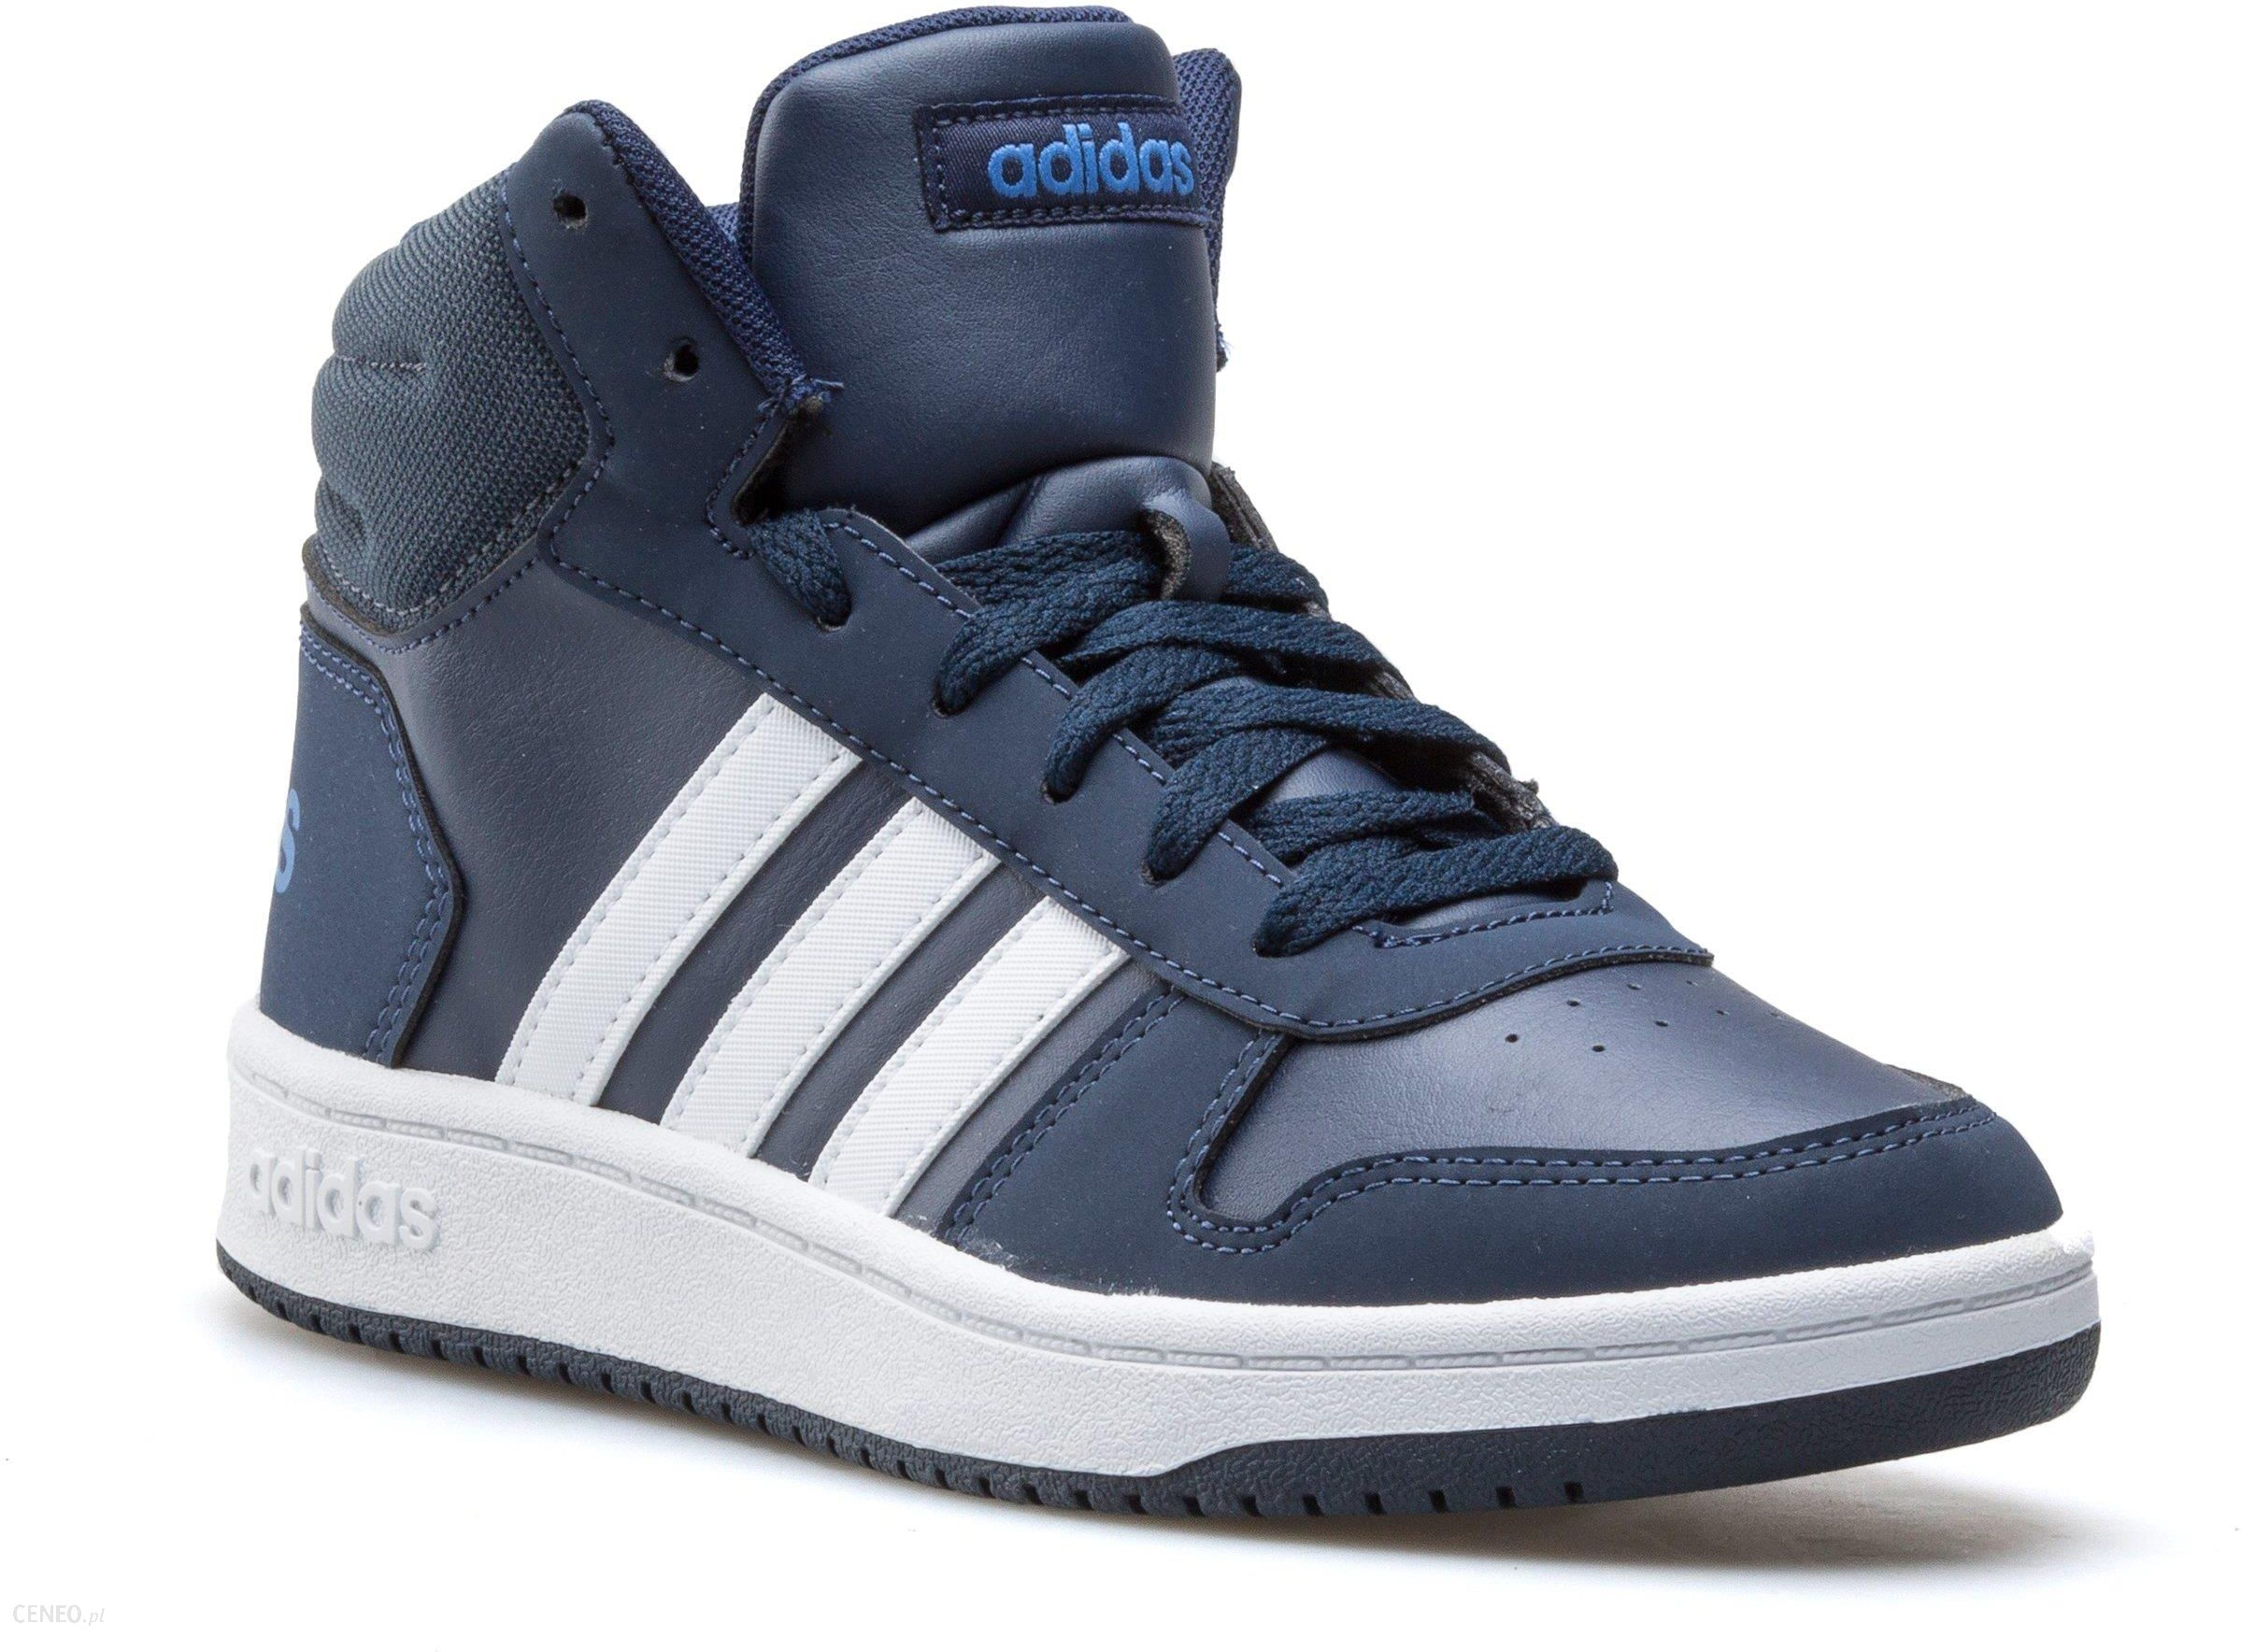 Buty adidas Hoops MID 2.0 K DB1950 r. 38 Ceny i opinie Ceneo.pl